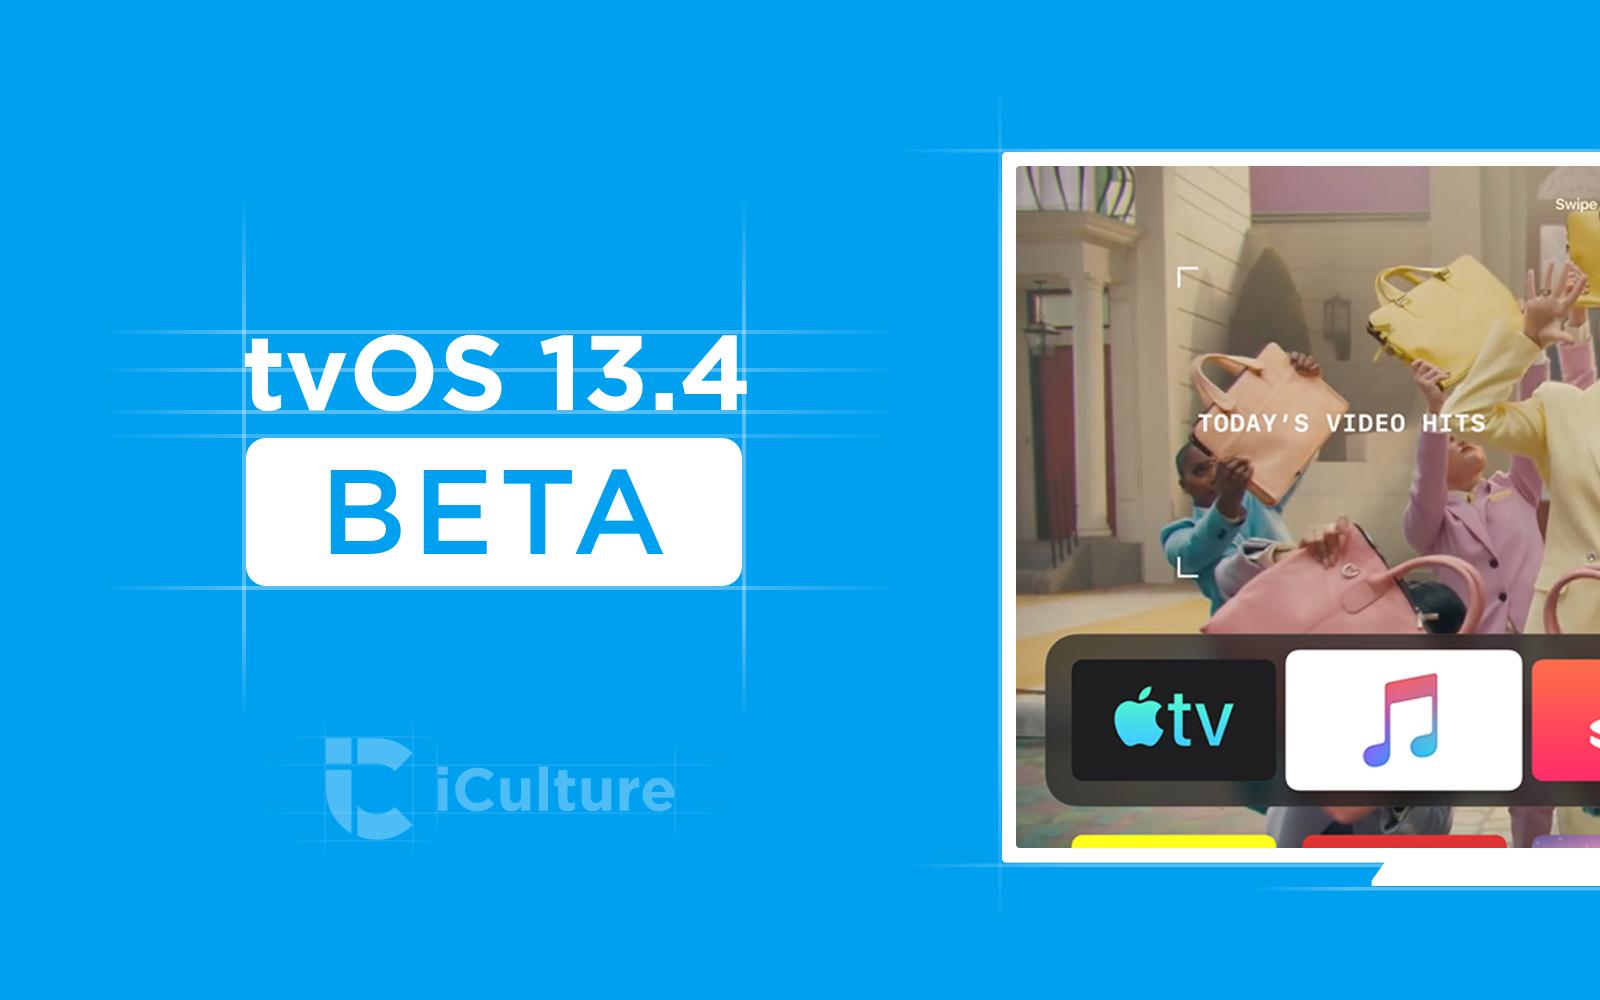 tvOS 13.4 beta.